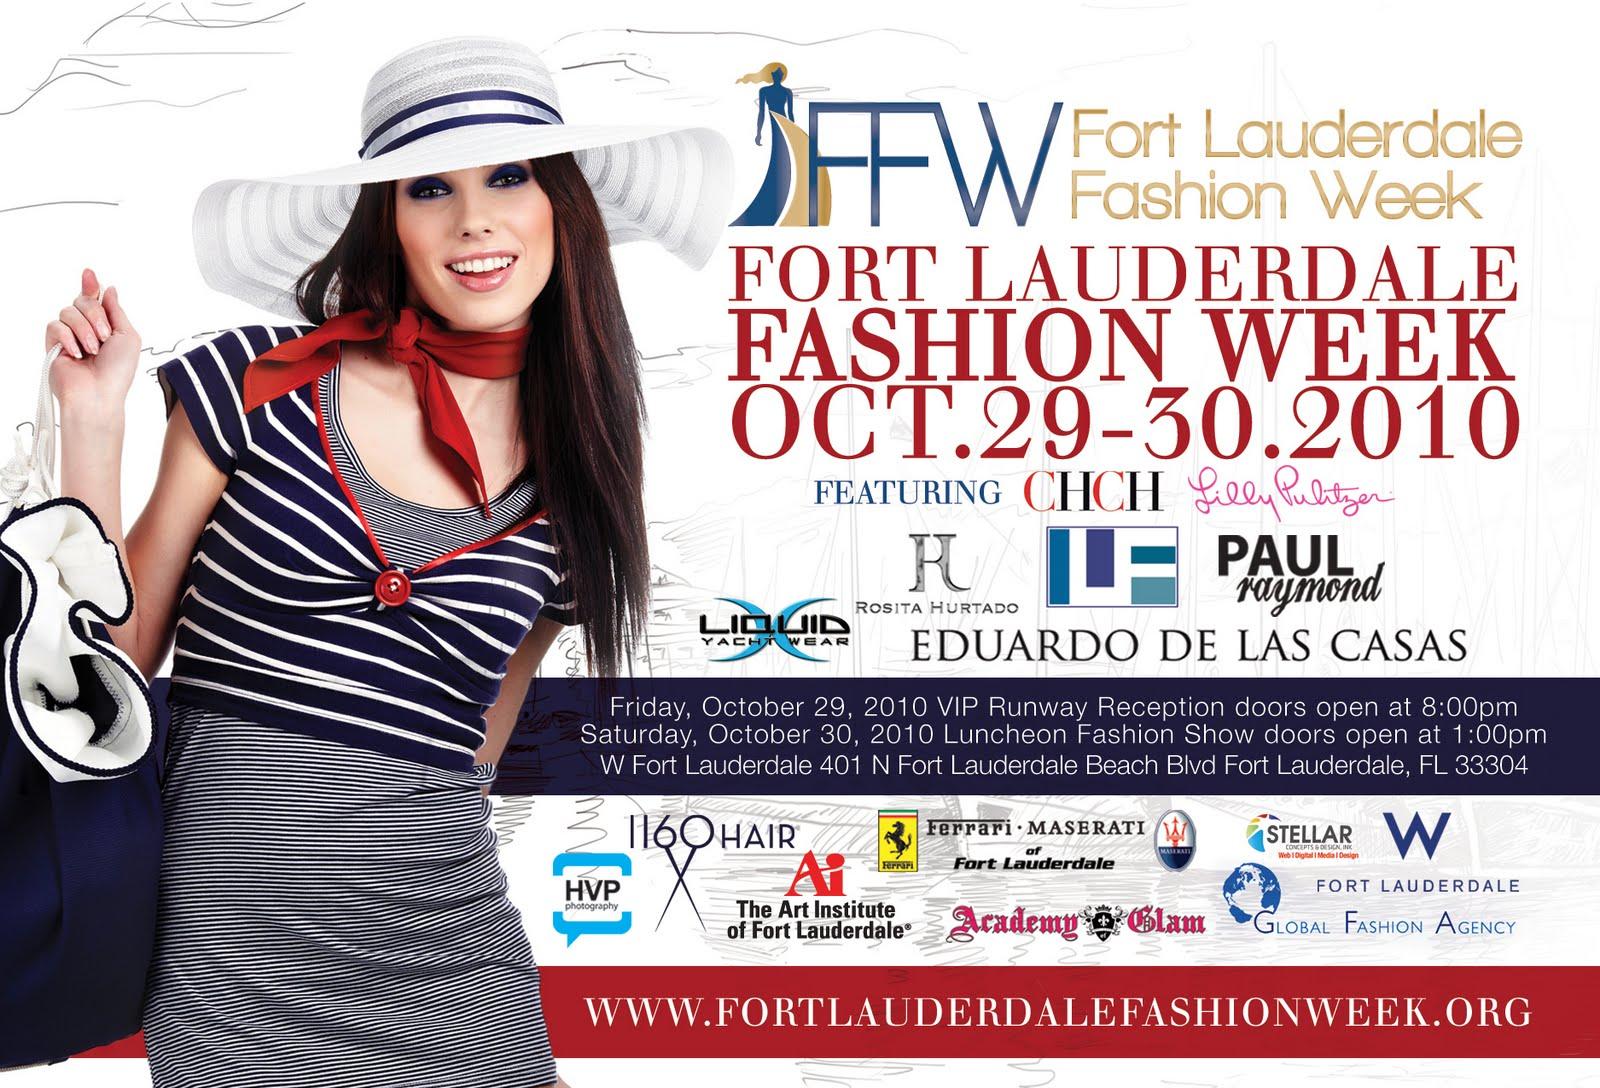 Fort lauderdale fashion week 48